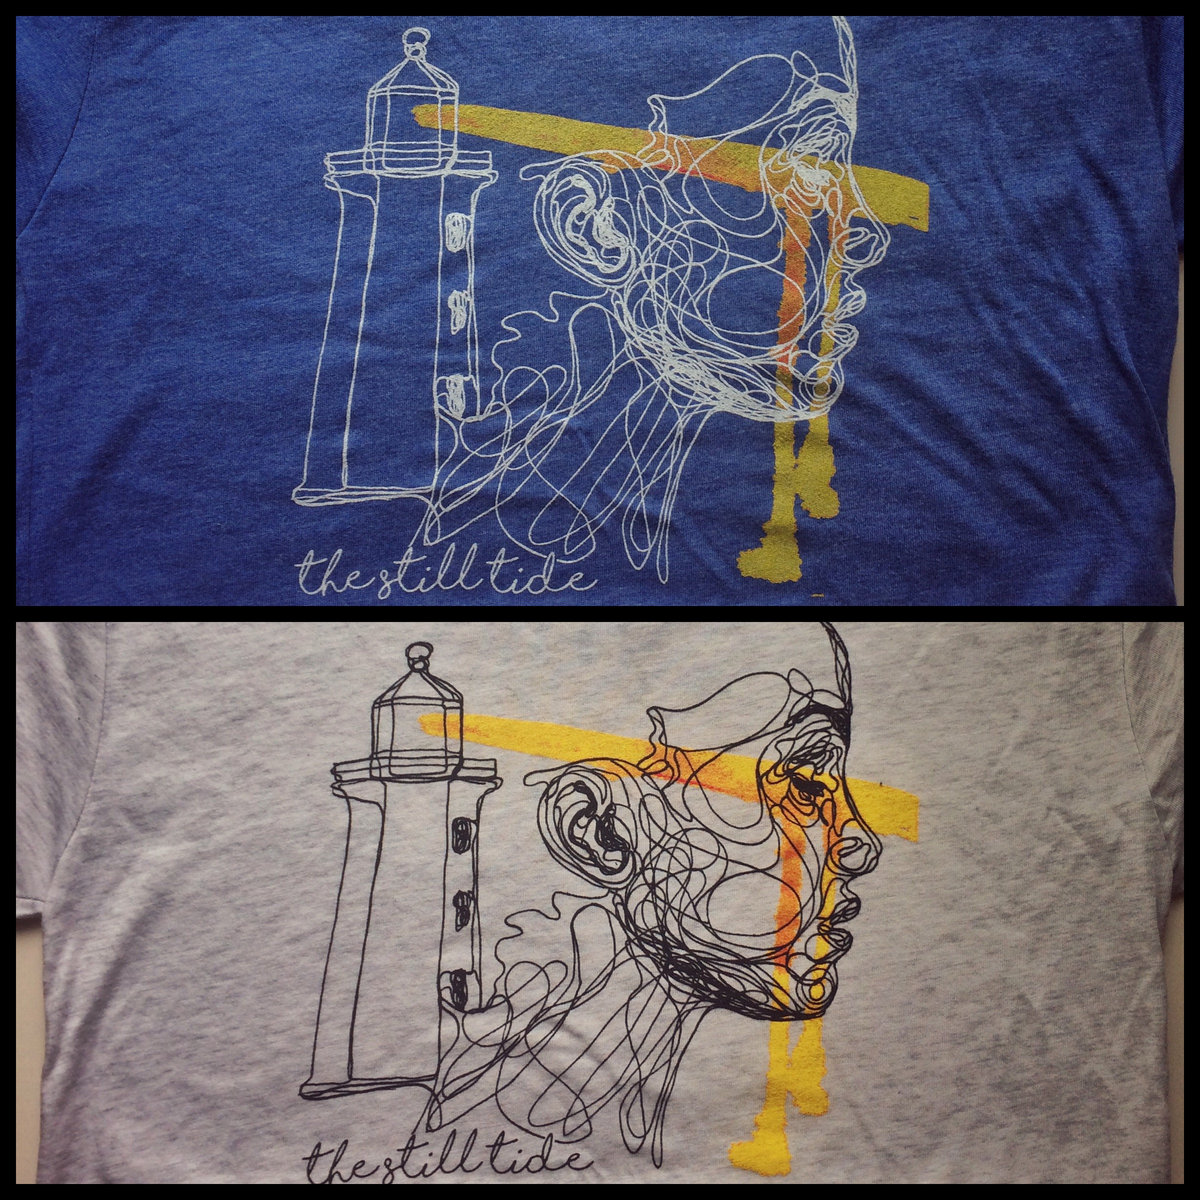 Astounding Lighthouse Face Beam T Shirt The Still Tide Wiring Digital Resources Anistprontobusorg